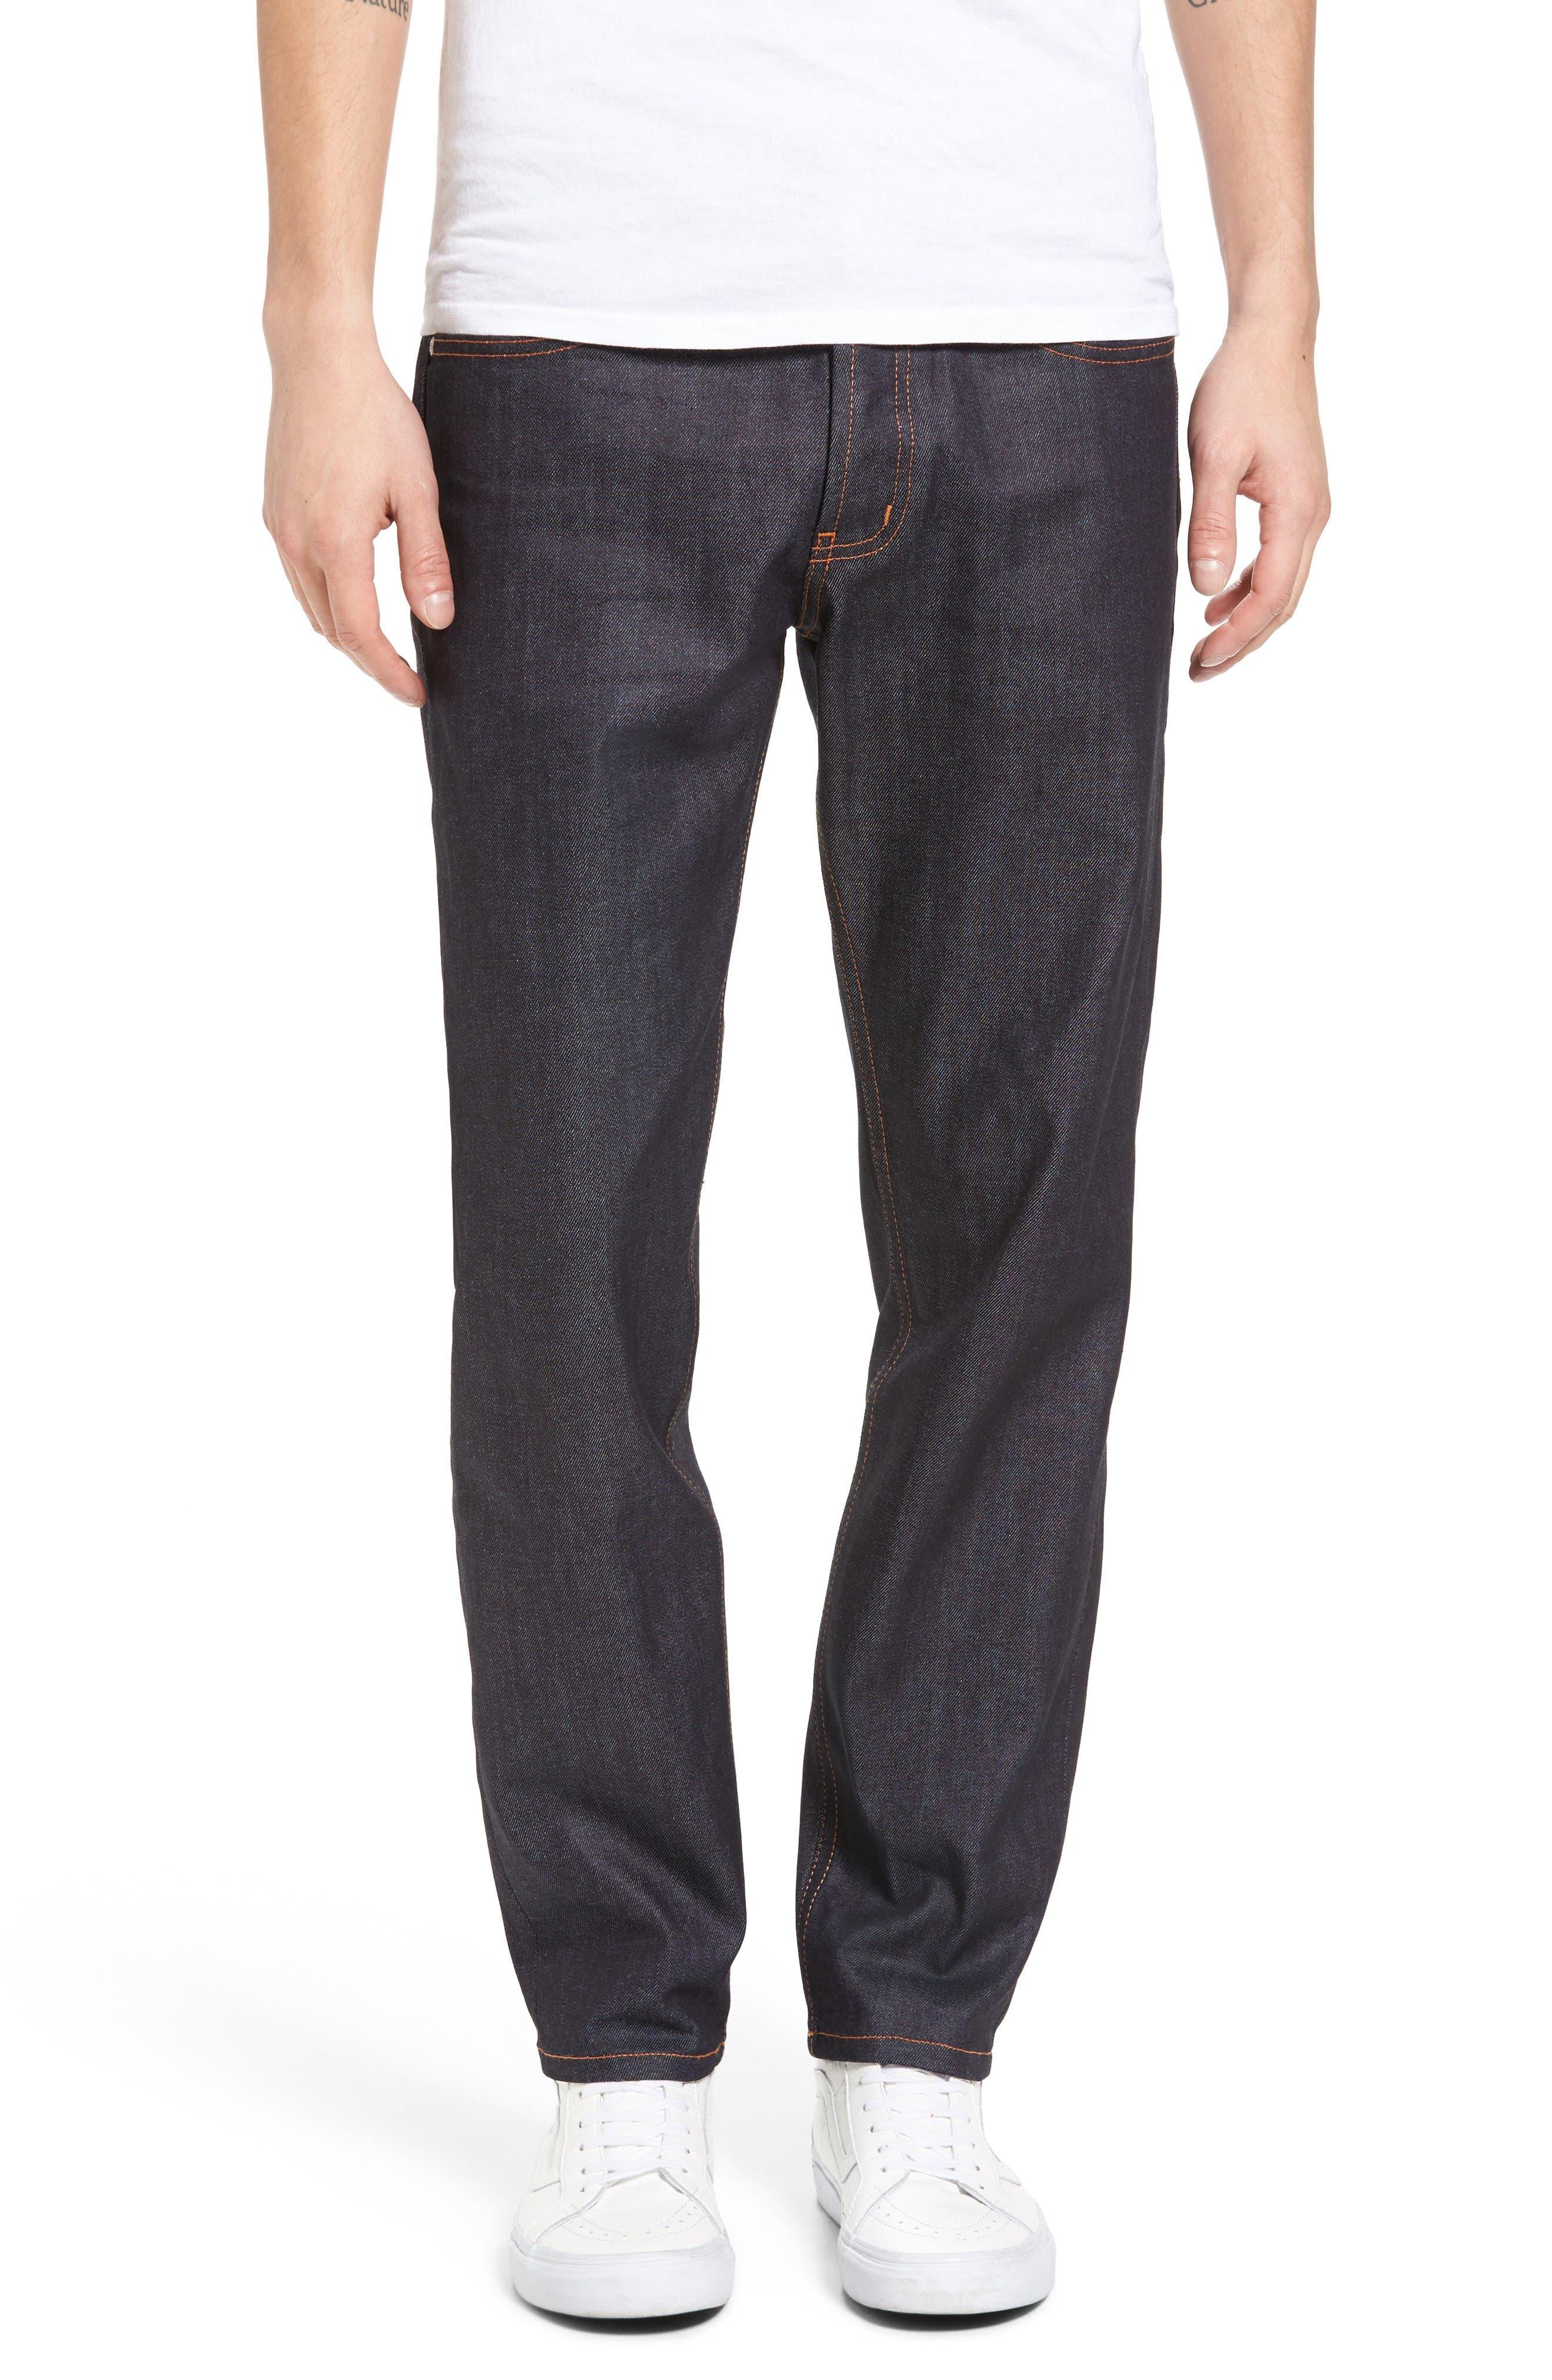 Main Image - Naked & Famous Denim Easy Guy 11 oz. Stretch Selvedge Skinny Fit Jeans (Indigo)